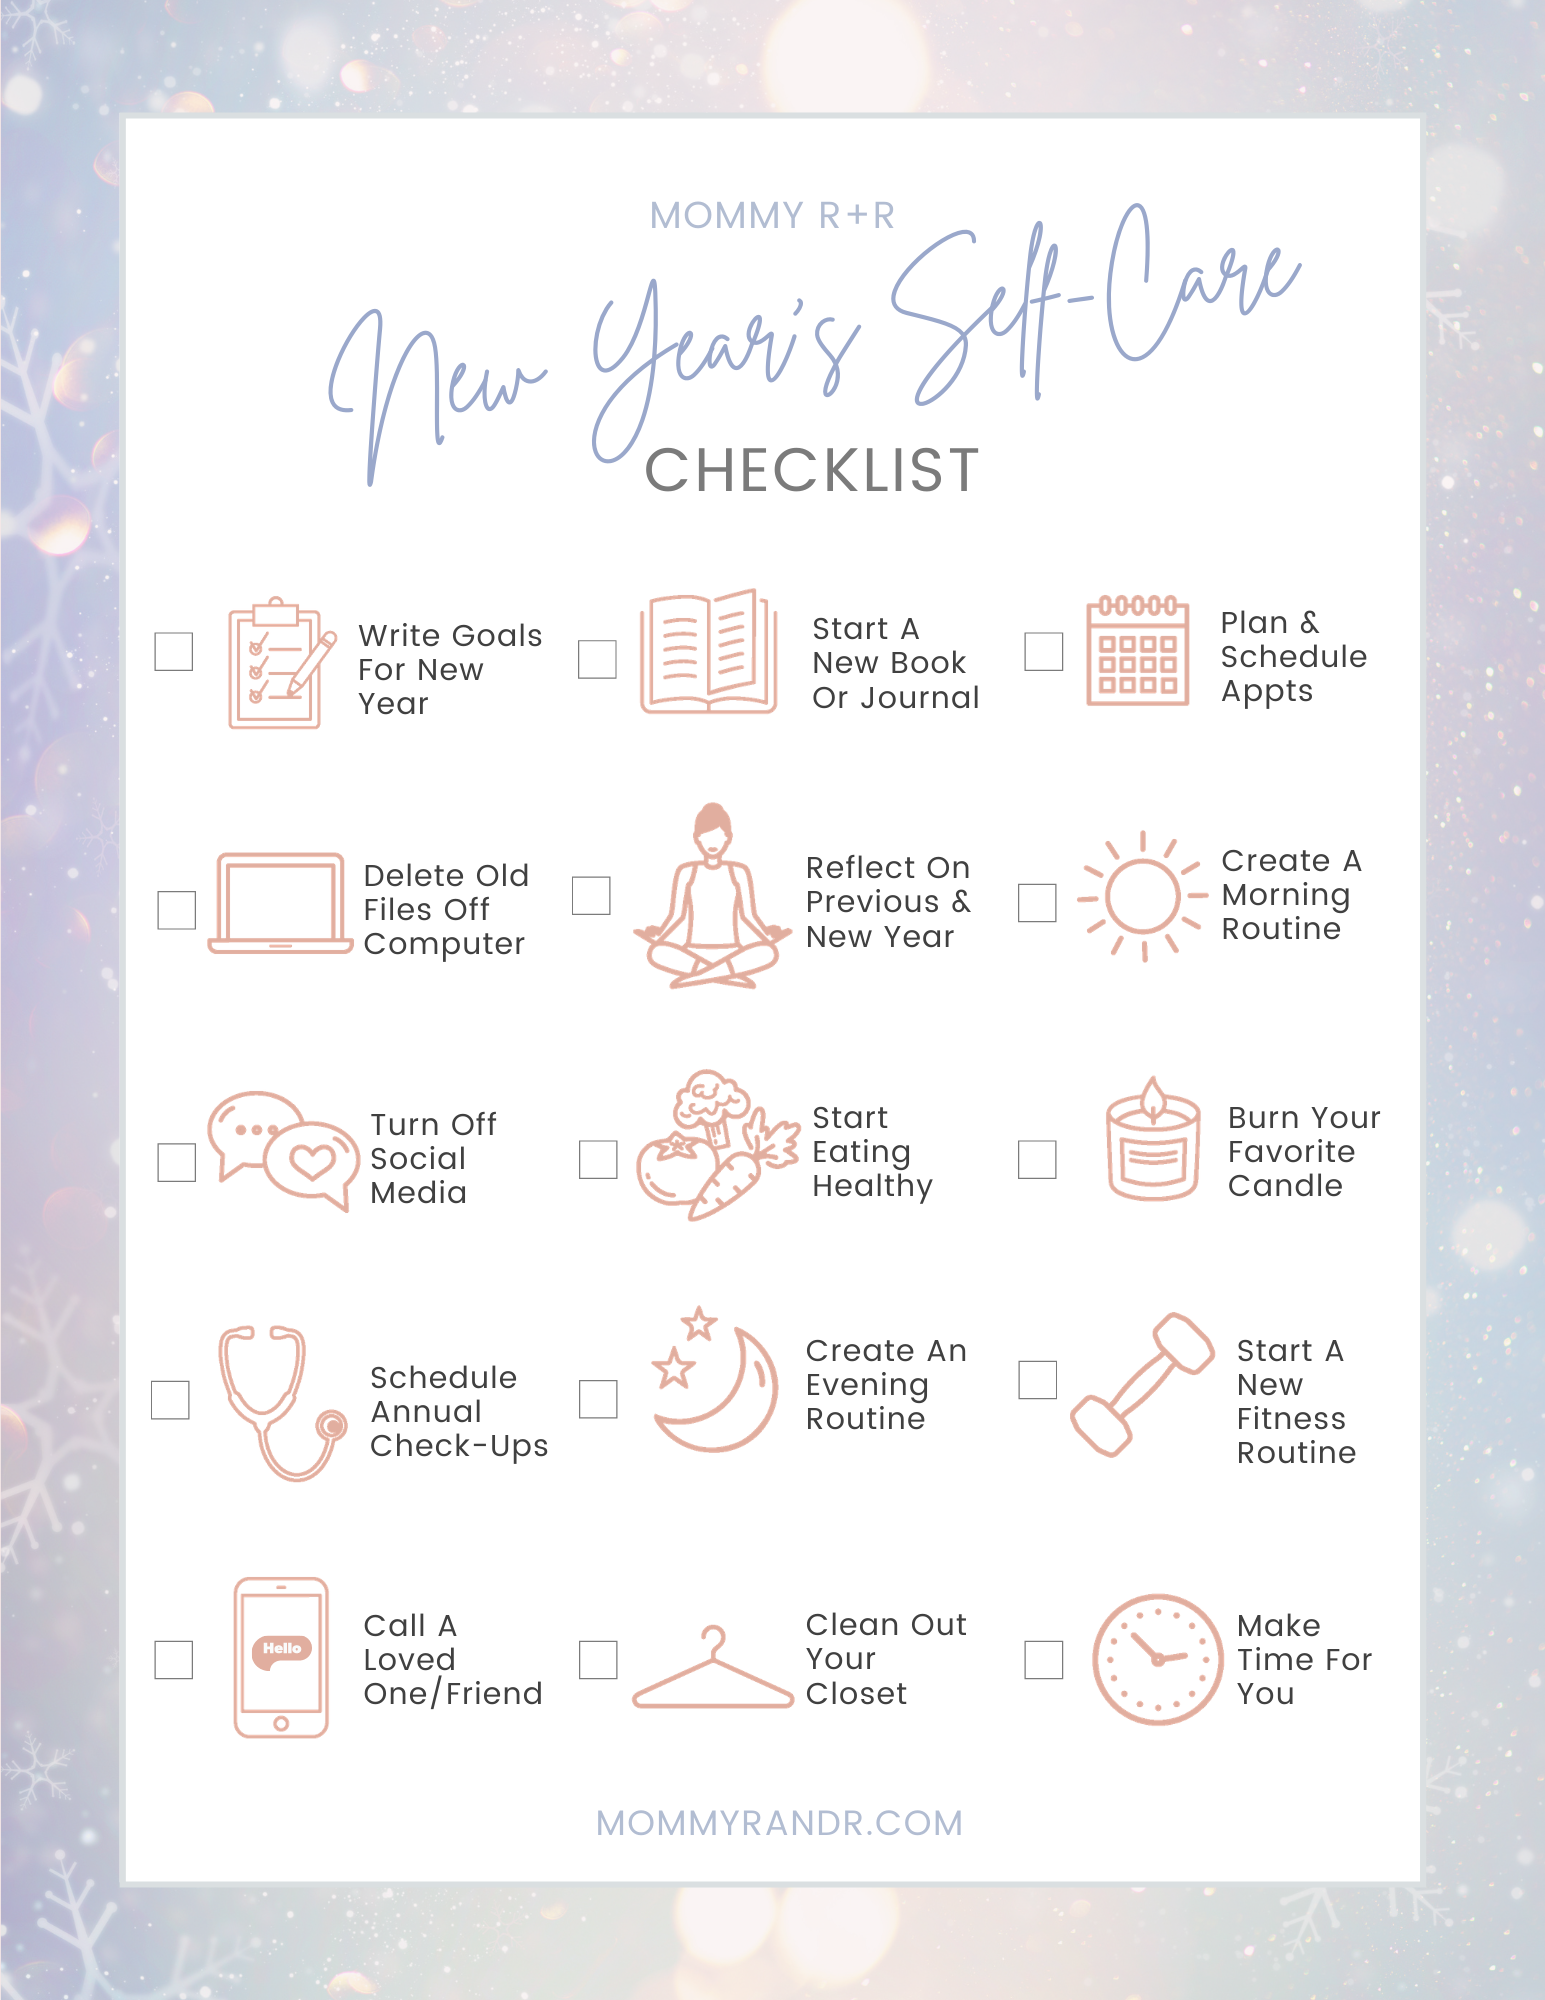 Self-Care Checklist mommyrandr valerie pierre